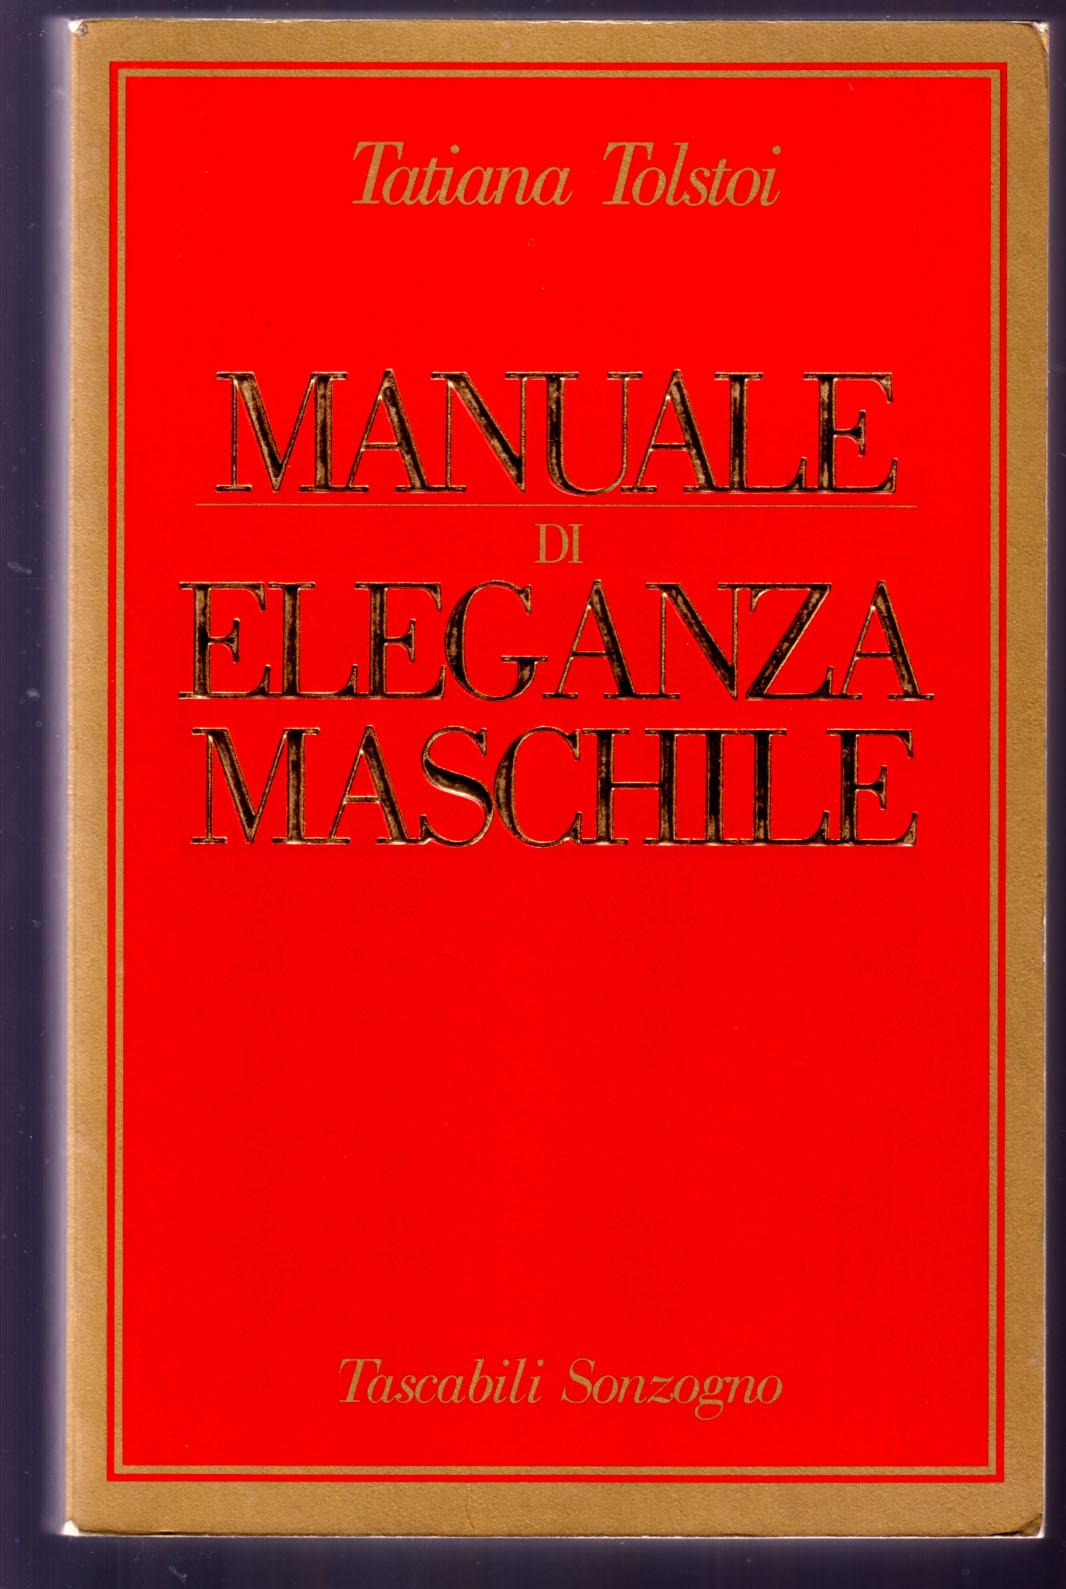 Il gentleman. Il manuale dell'eleganza maschile bernhard roetzel.